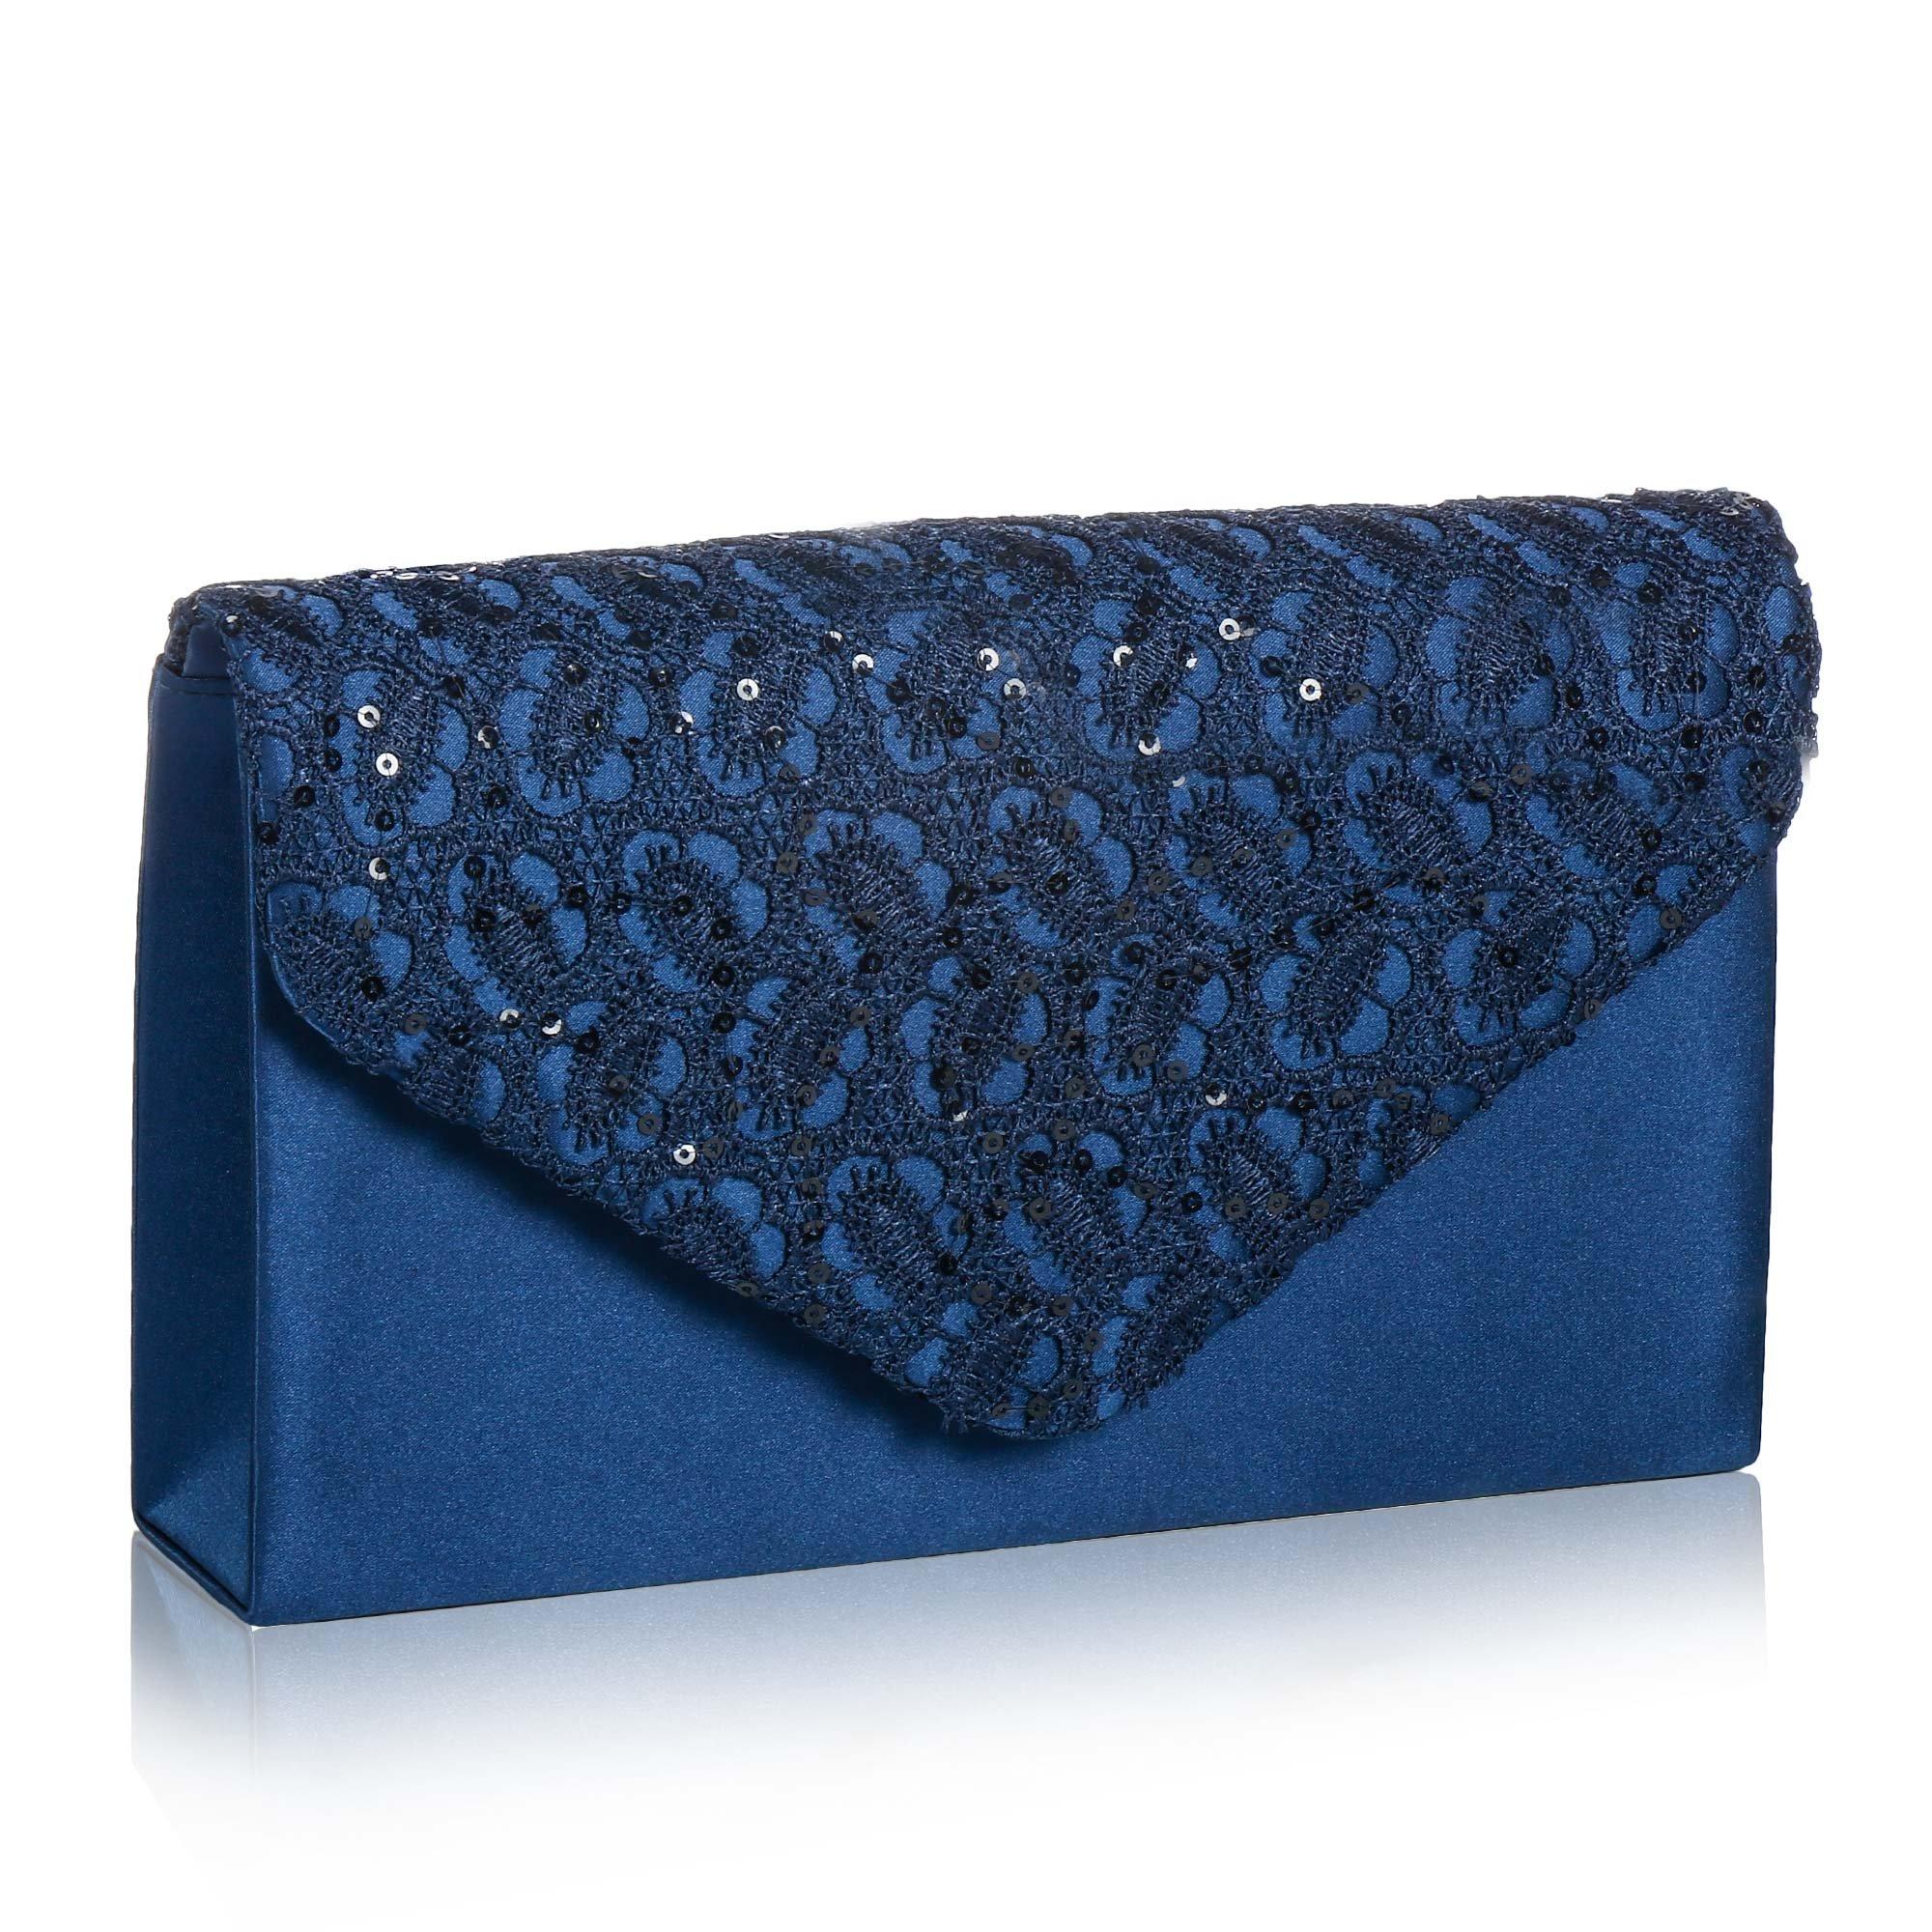 Womens Elegant Floral Lace Envelope Clutch,Wallyns Evening Bag Handbag Navy